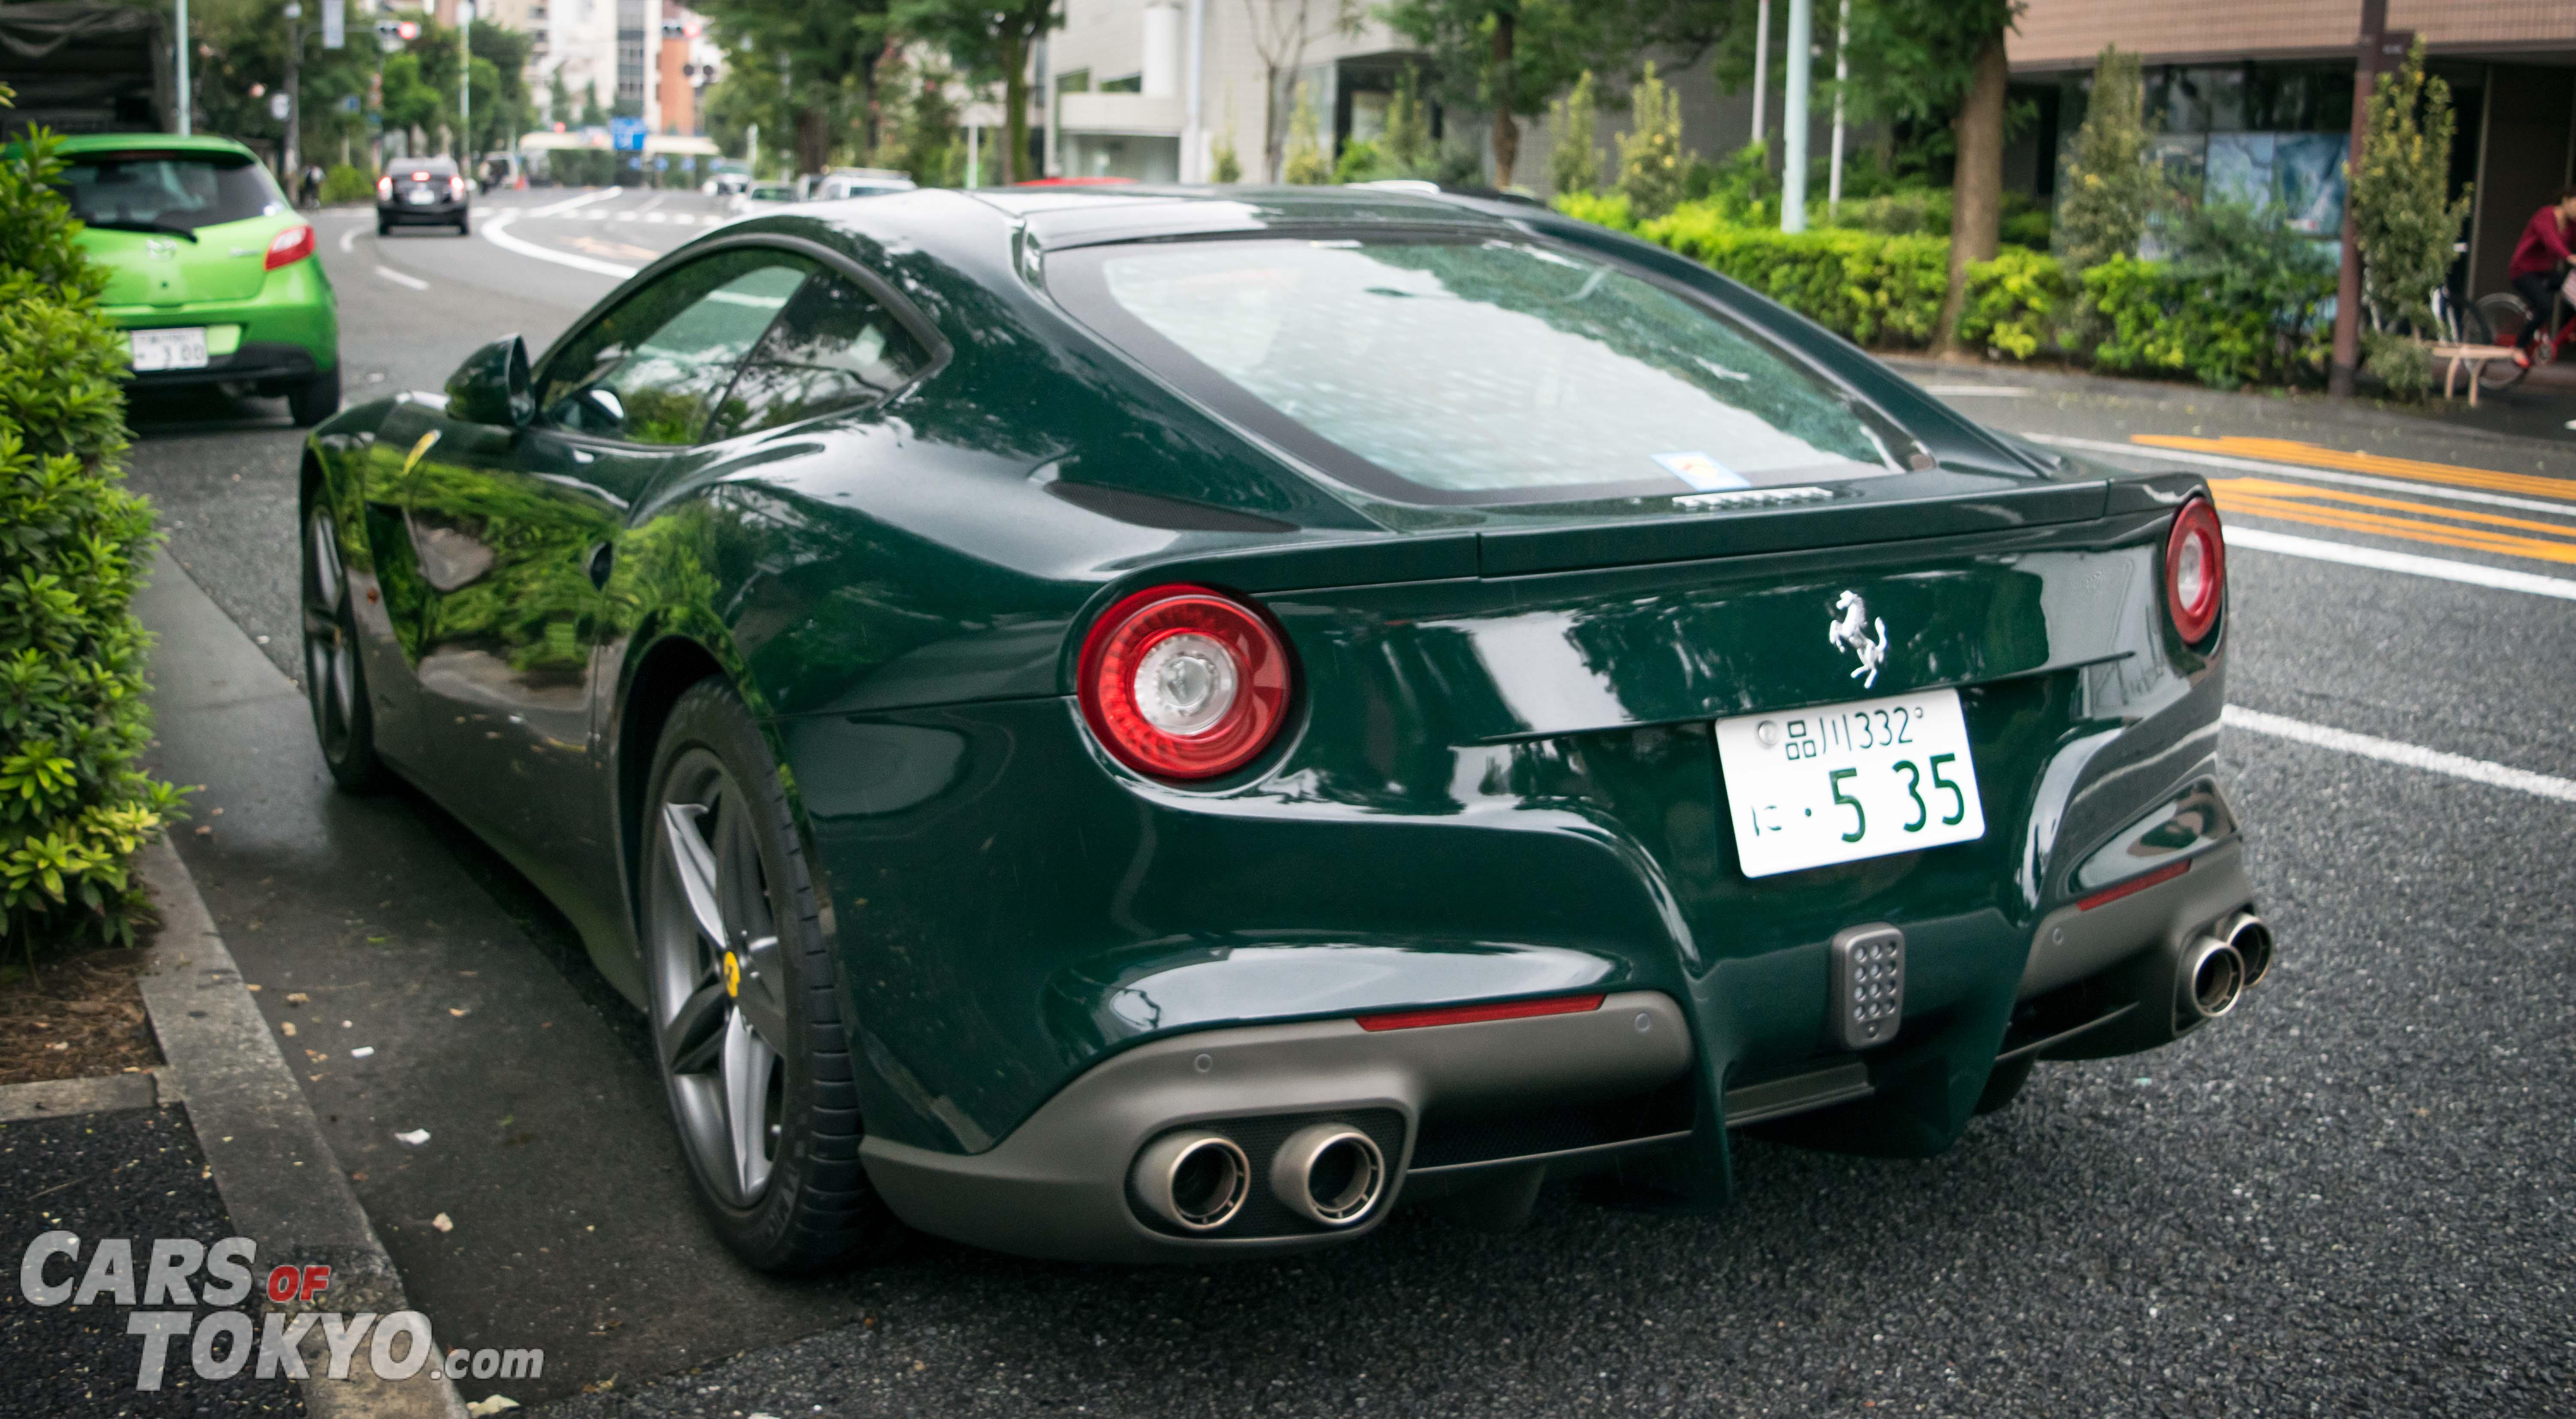 Cars of Tokyo Unusual Spec Ferrari F12